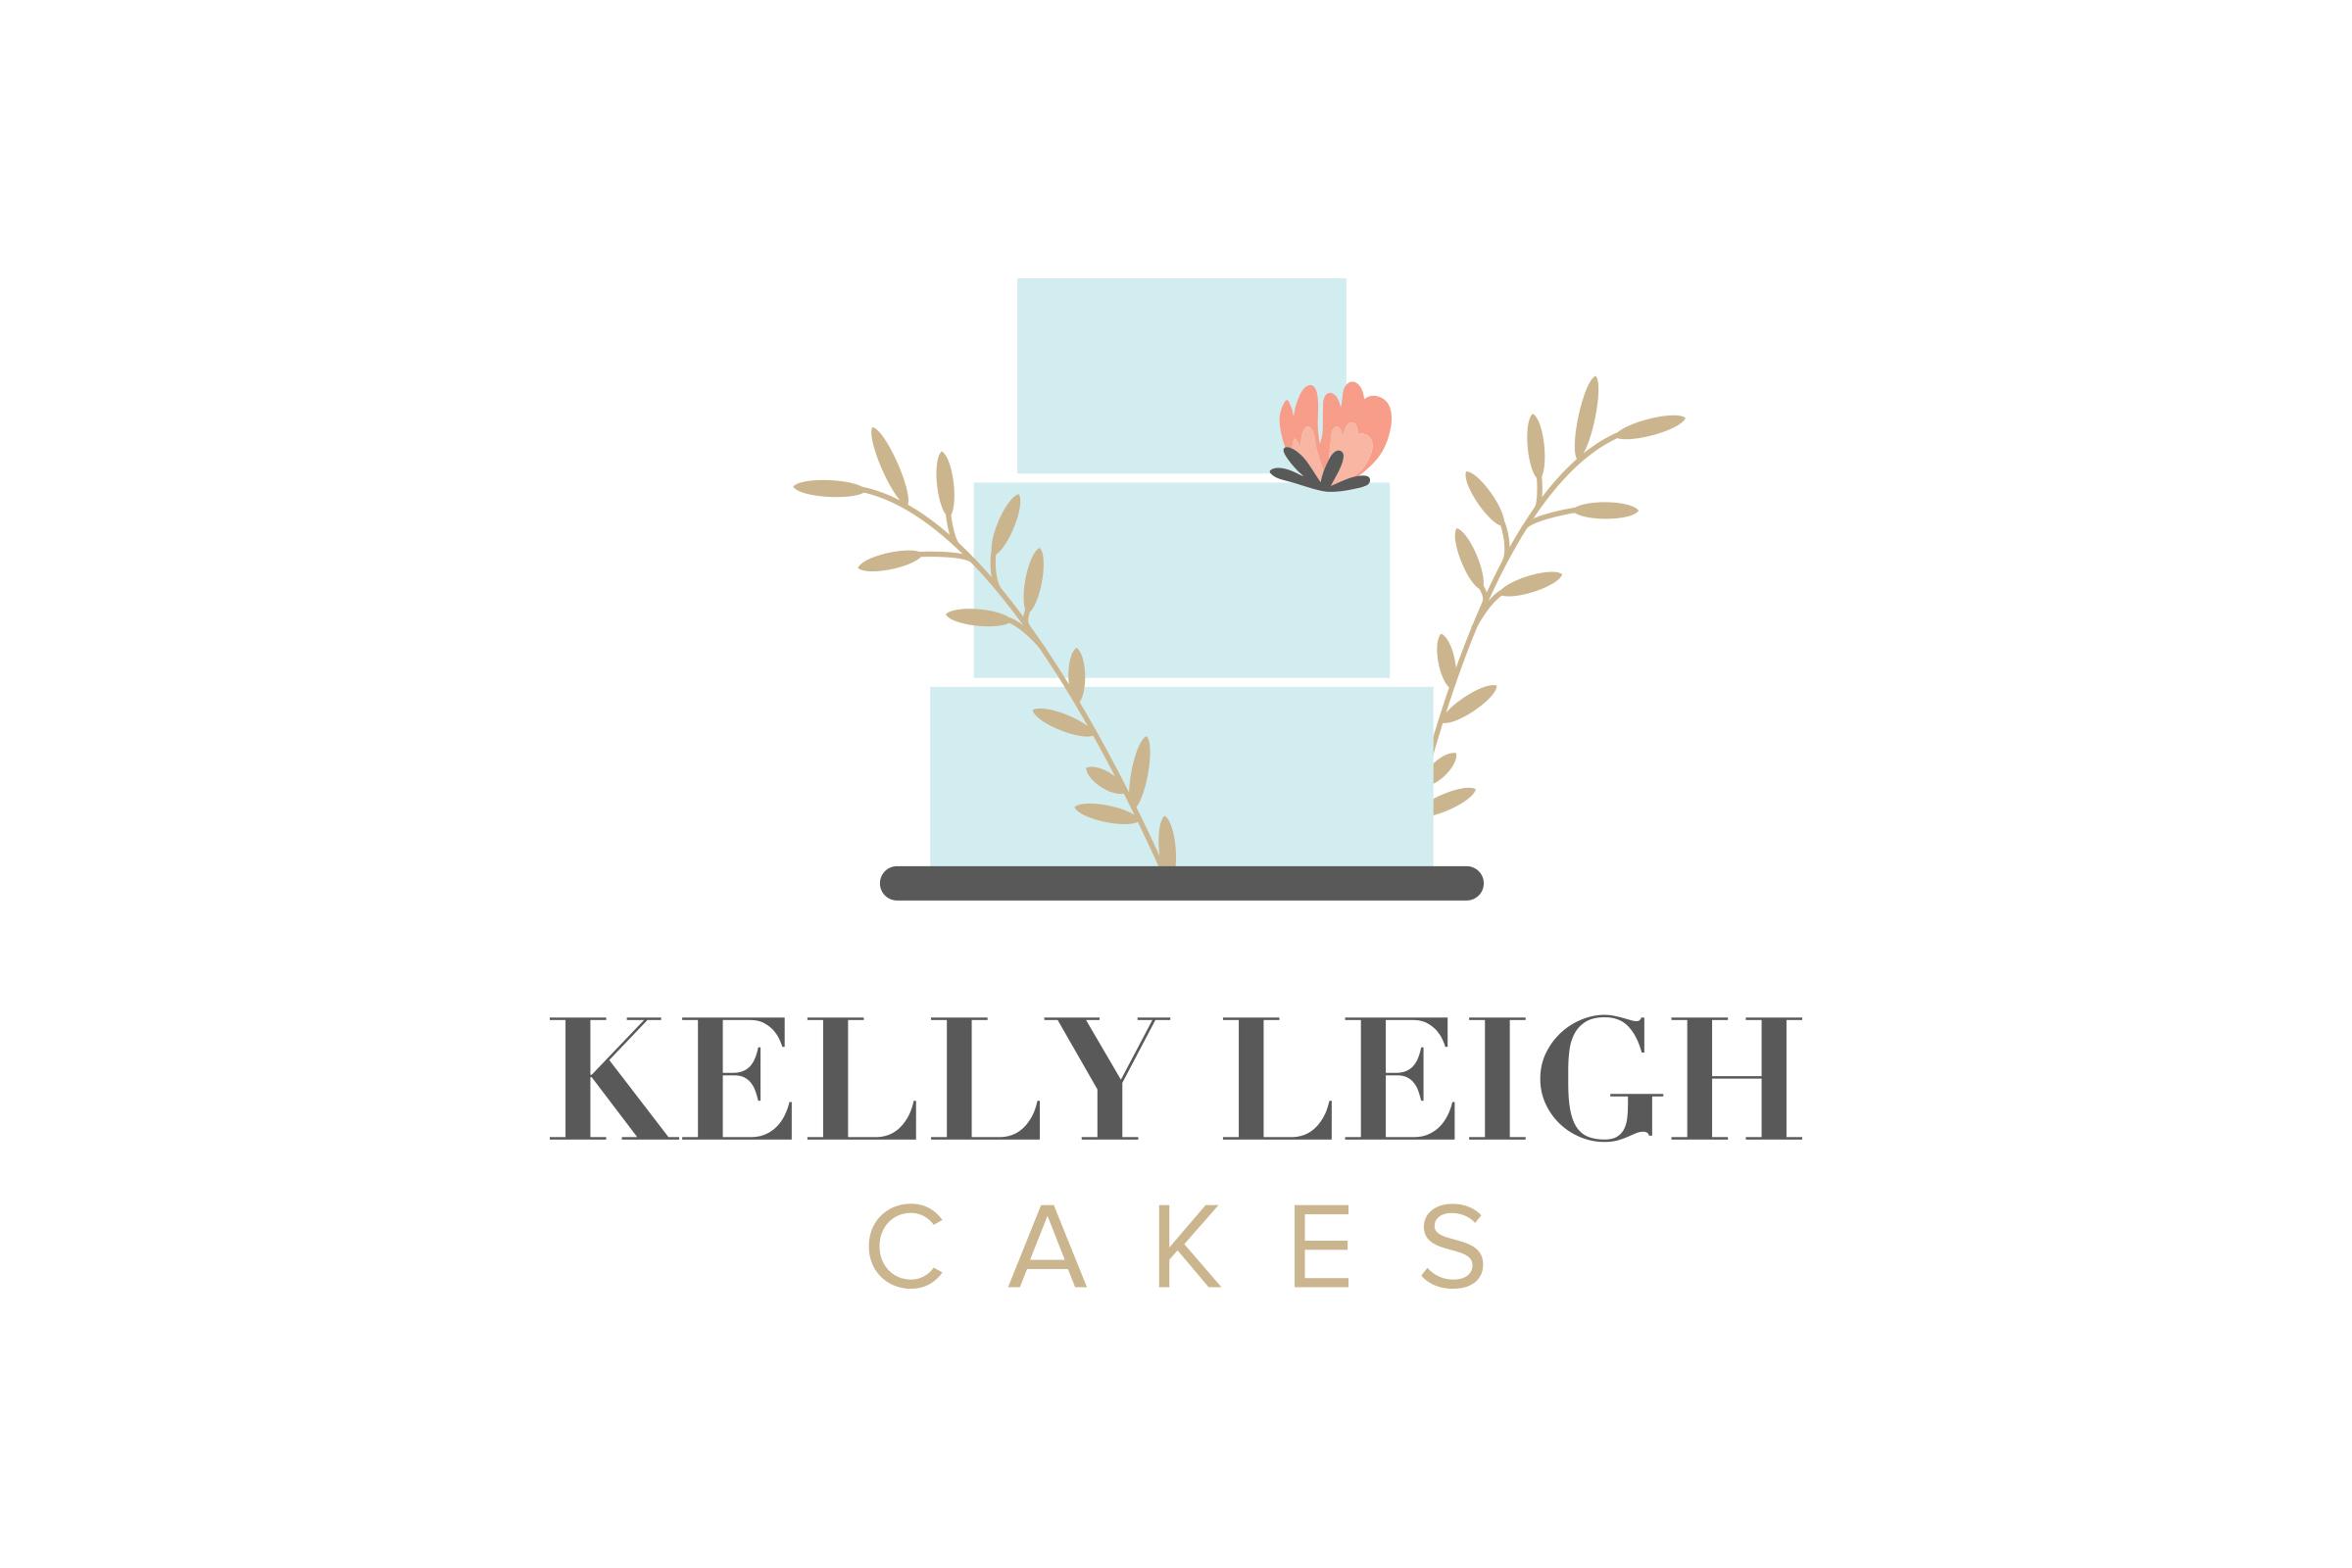 hearthfire-creative-logo-brand-identity-designer-denver-colorado-kelly-leigh-cakes-3.jpg